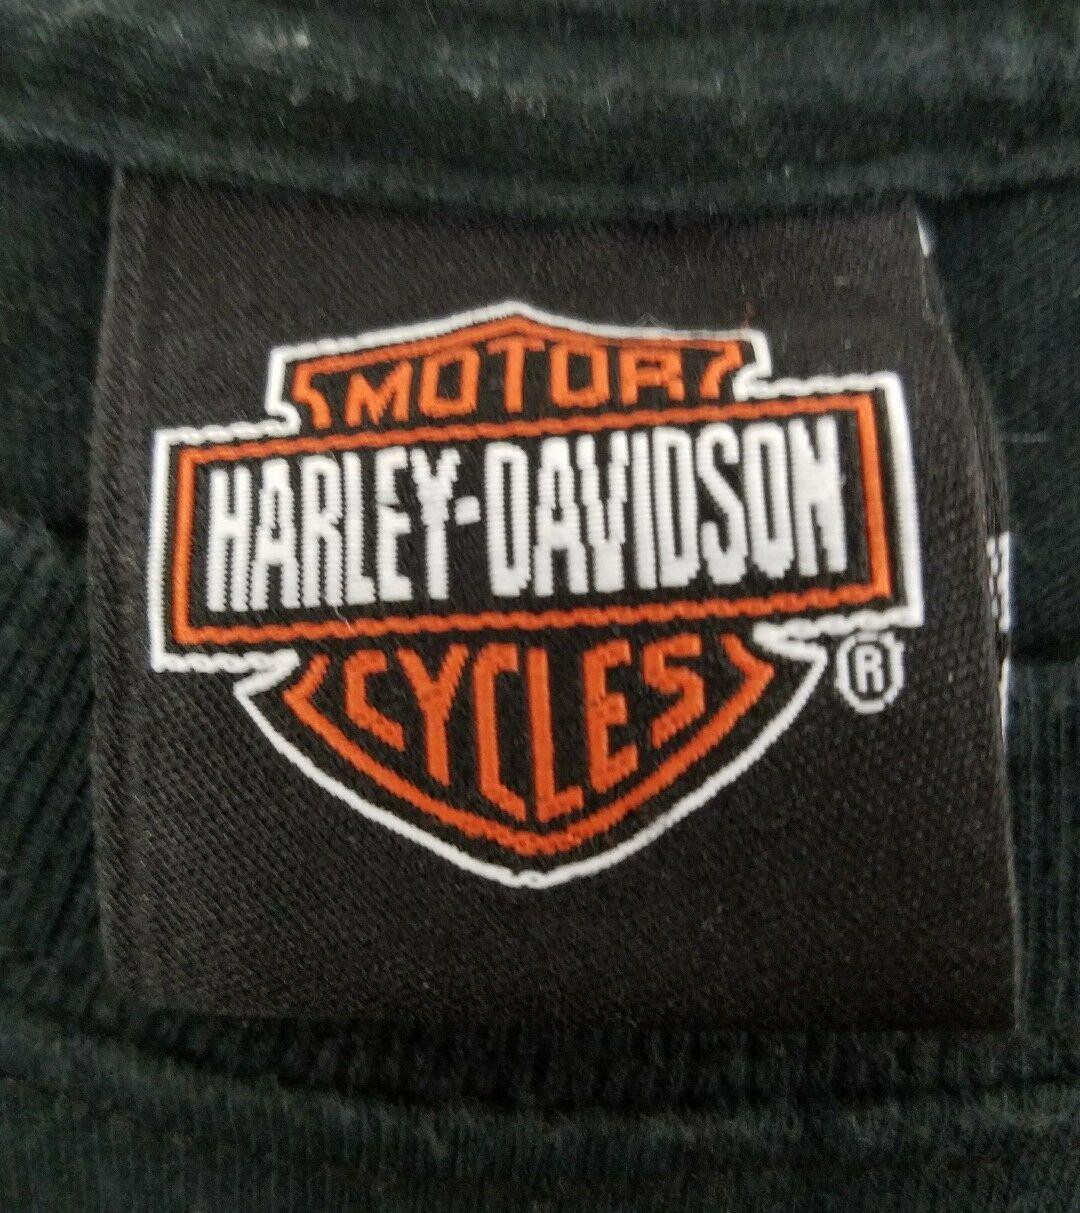 Harley Davidson Plainfield Indiana I-70 Black S/S Men's Motorcycle T Shirt XXL image 5